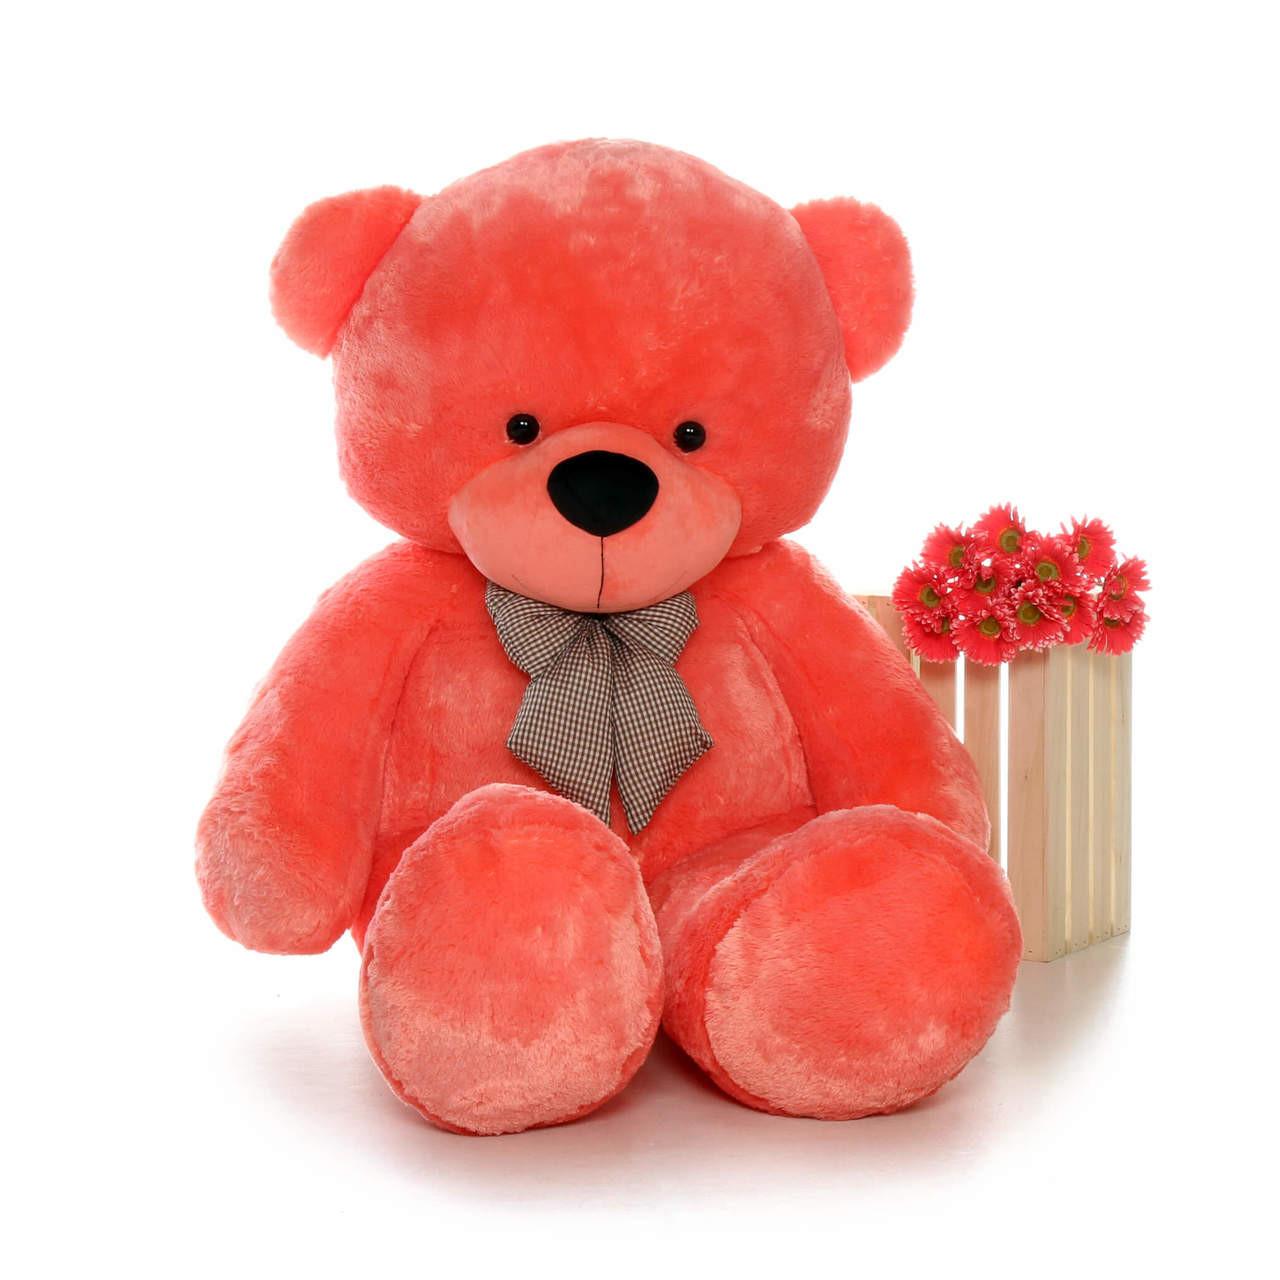 Giant Bubble Gum Pink Unique Colored 6 Foot Giant Teddy Bear